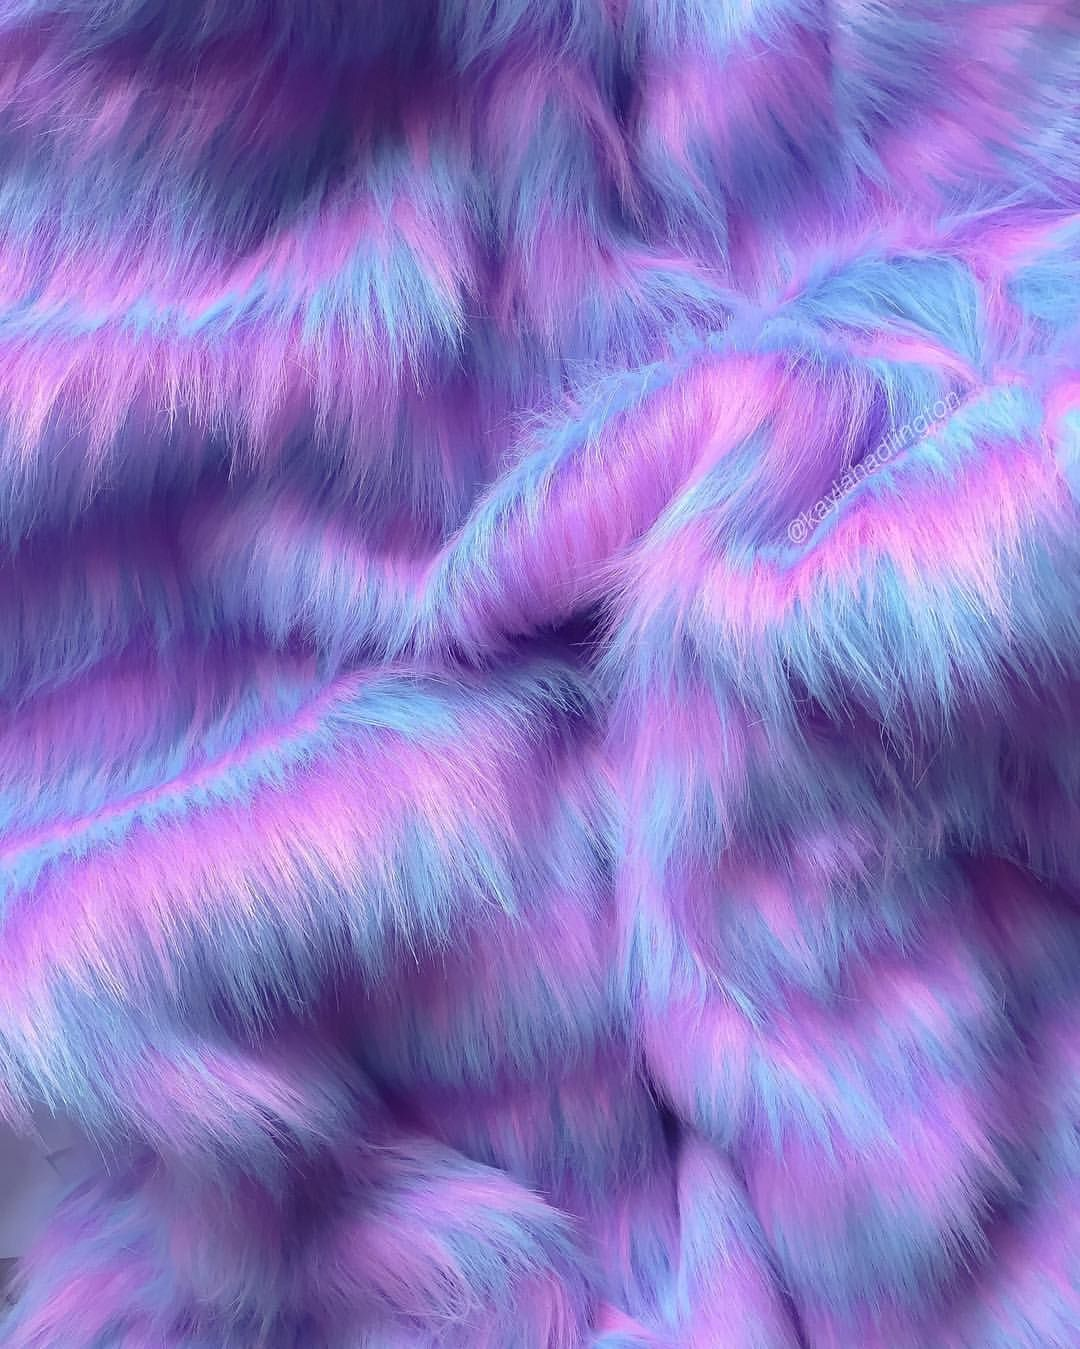 Wallpaper Iphone Violet: Пин от пользователя Лина Холодная на доске Fur